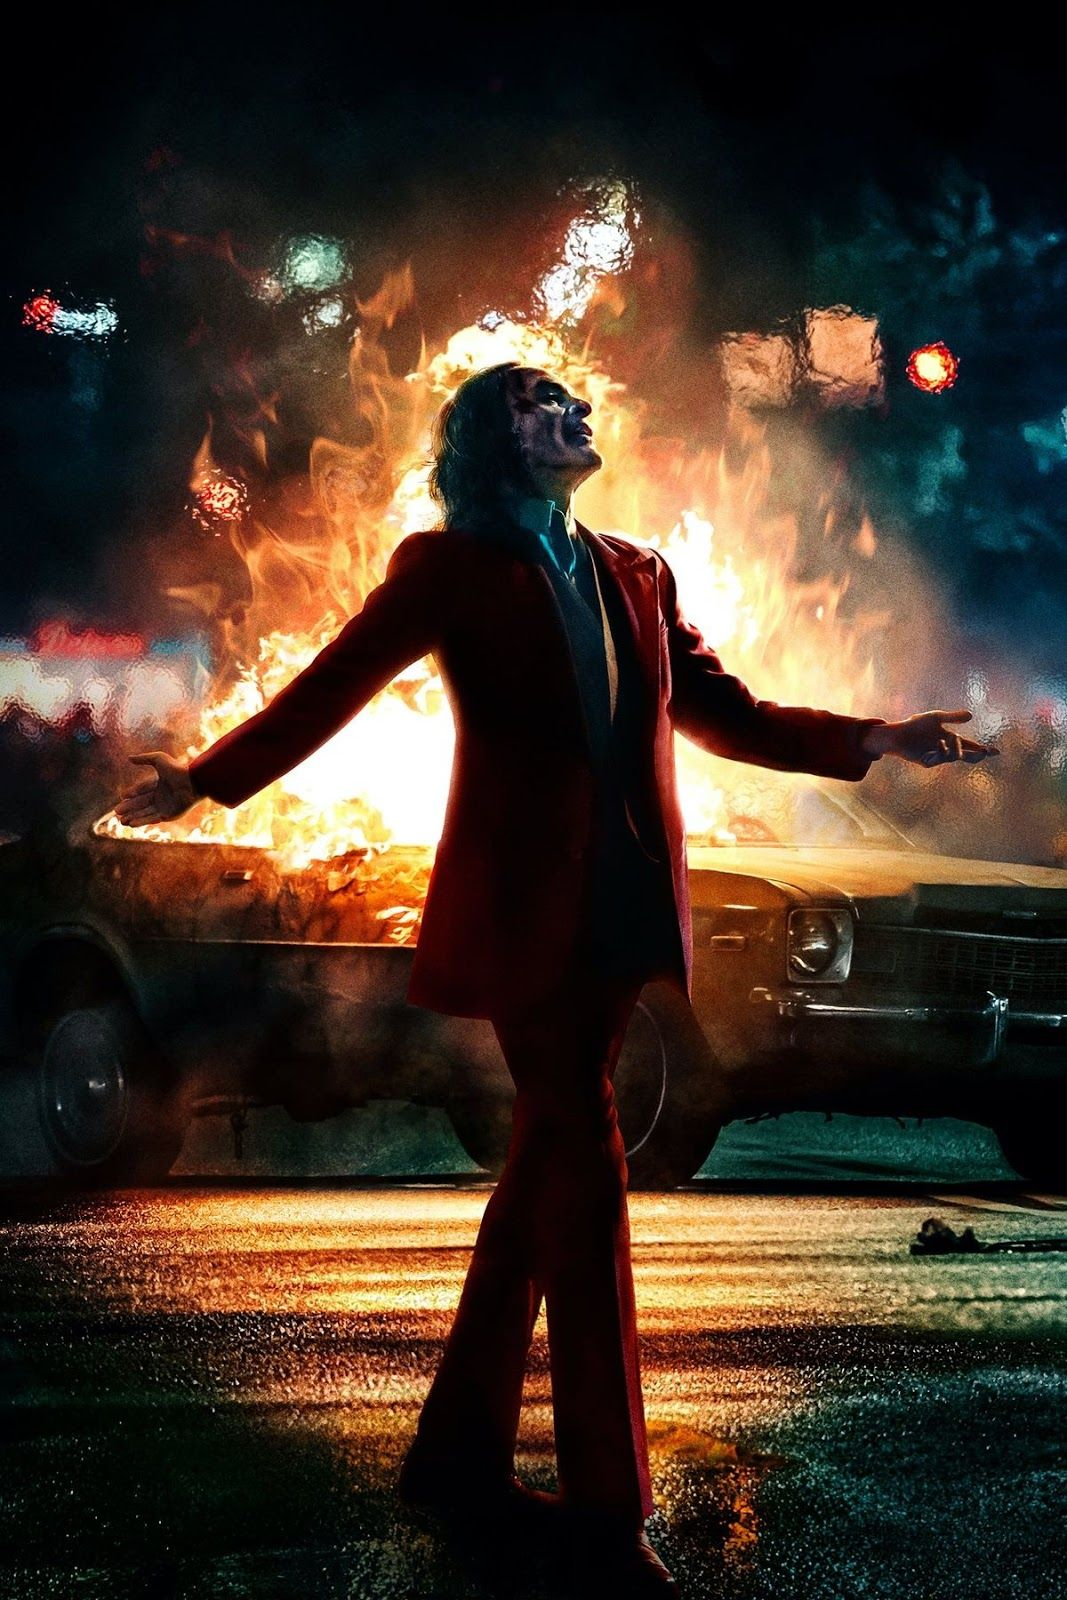 Pin by j on Batty, batty, bat in 2020 Joker full movie